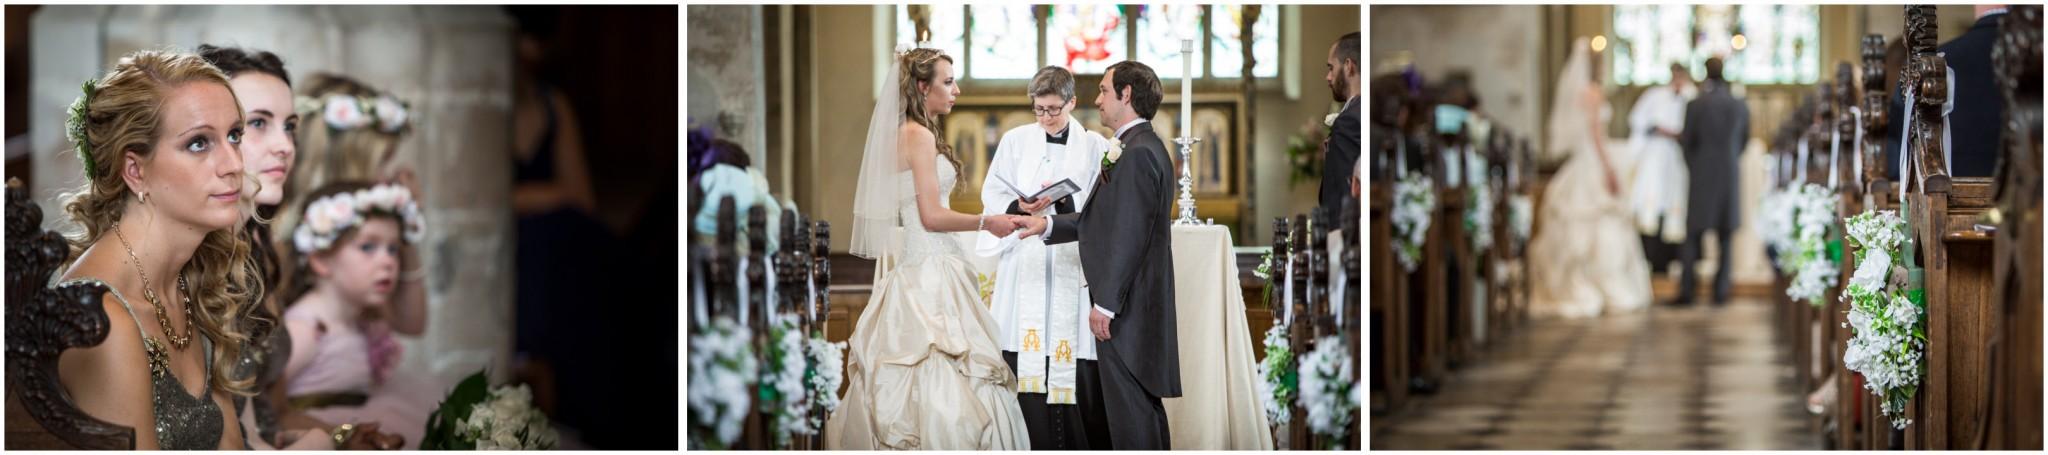 Highfield Park Wedding Photography Wedding Vows